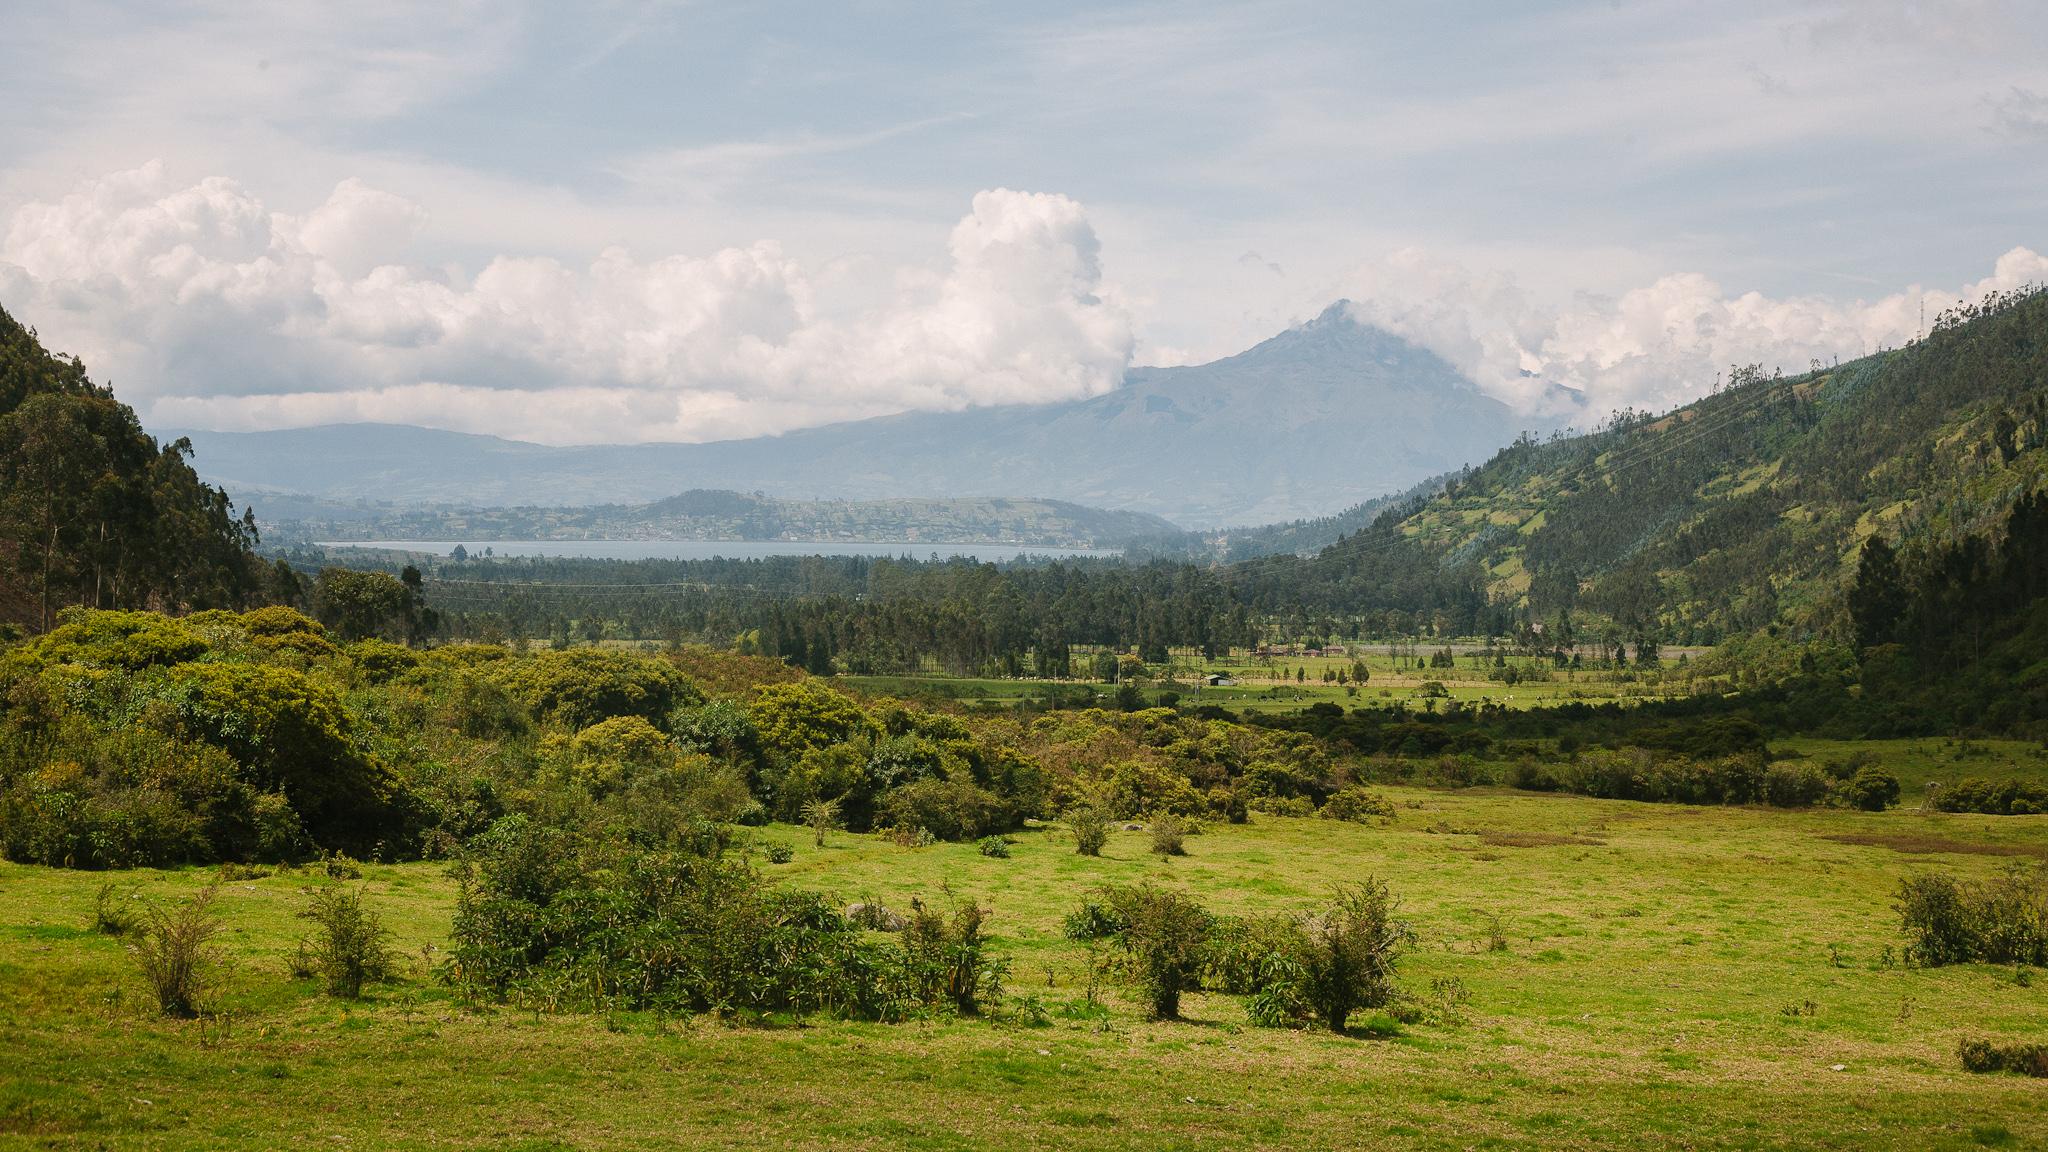 Ecuador2011_Mountains&Sea_Web_jenniferleahy-023.jpg